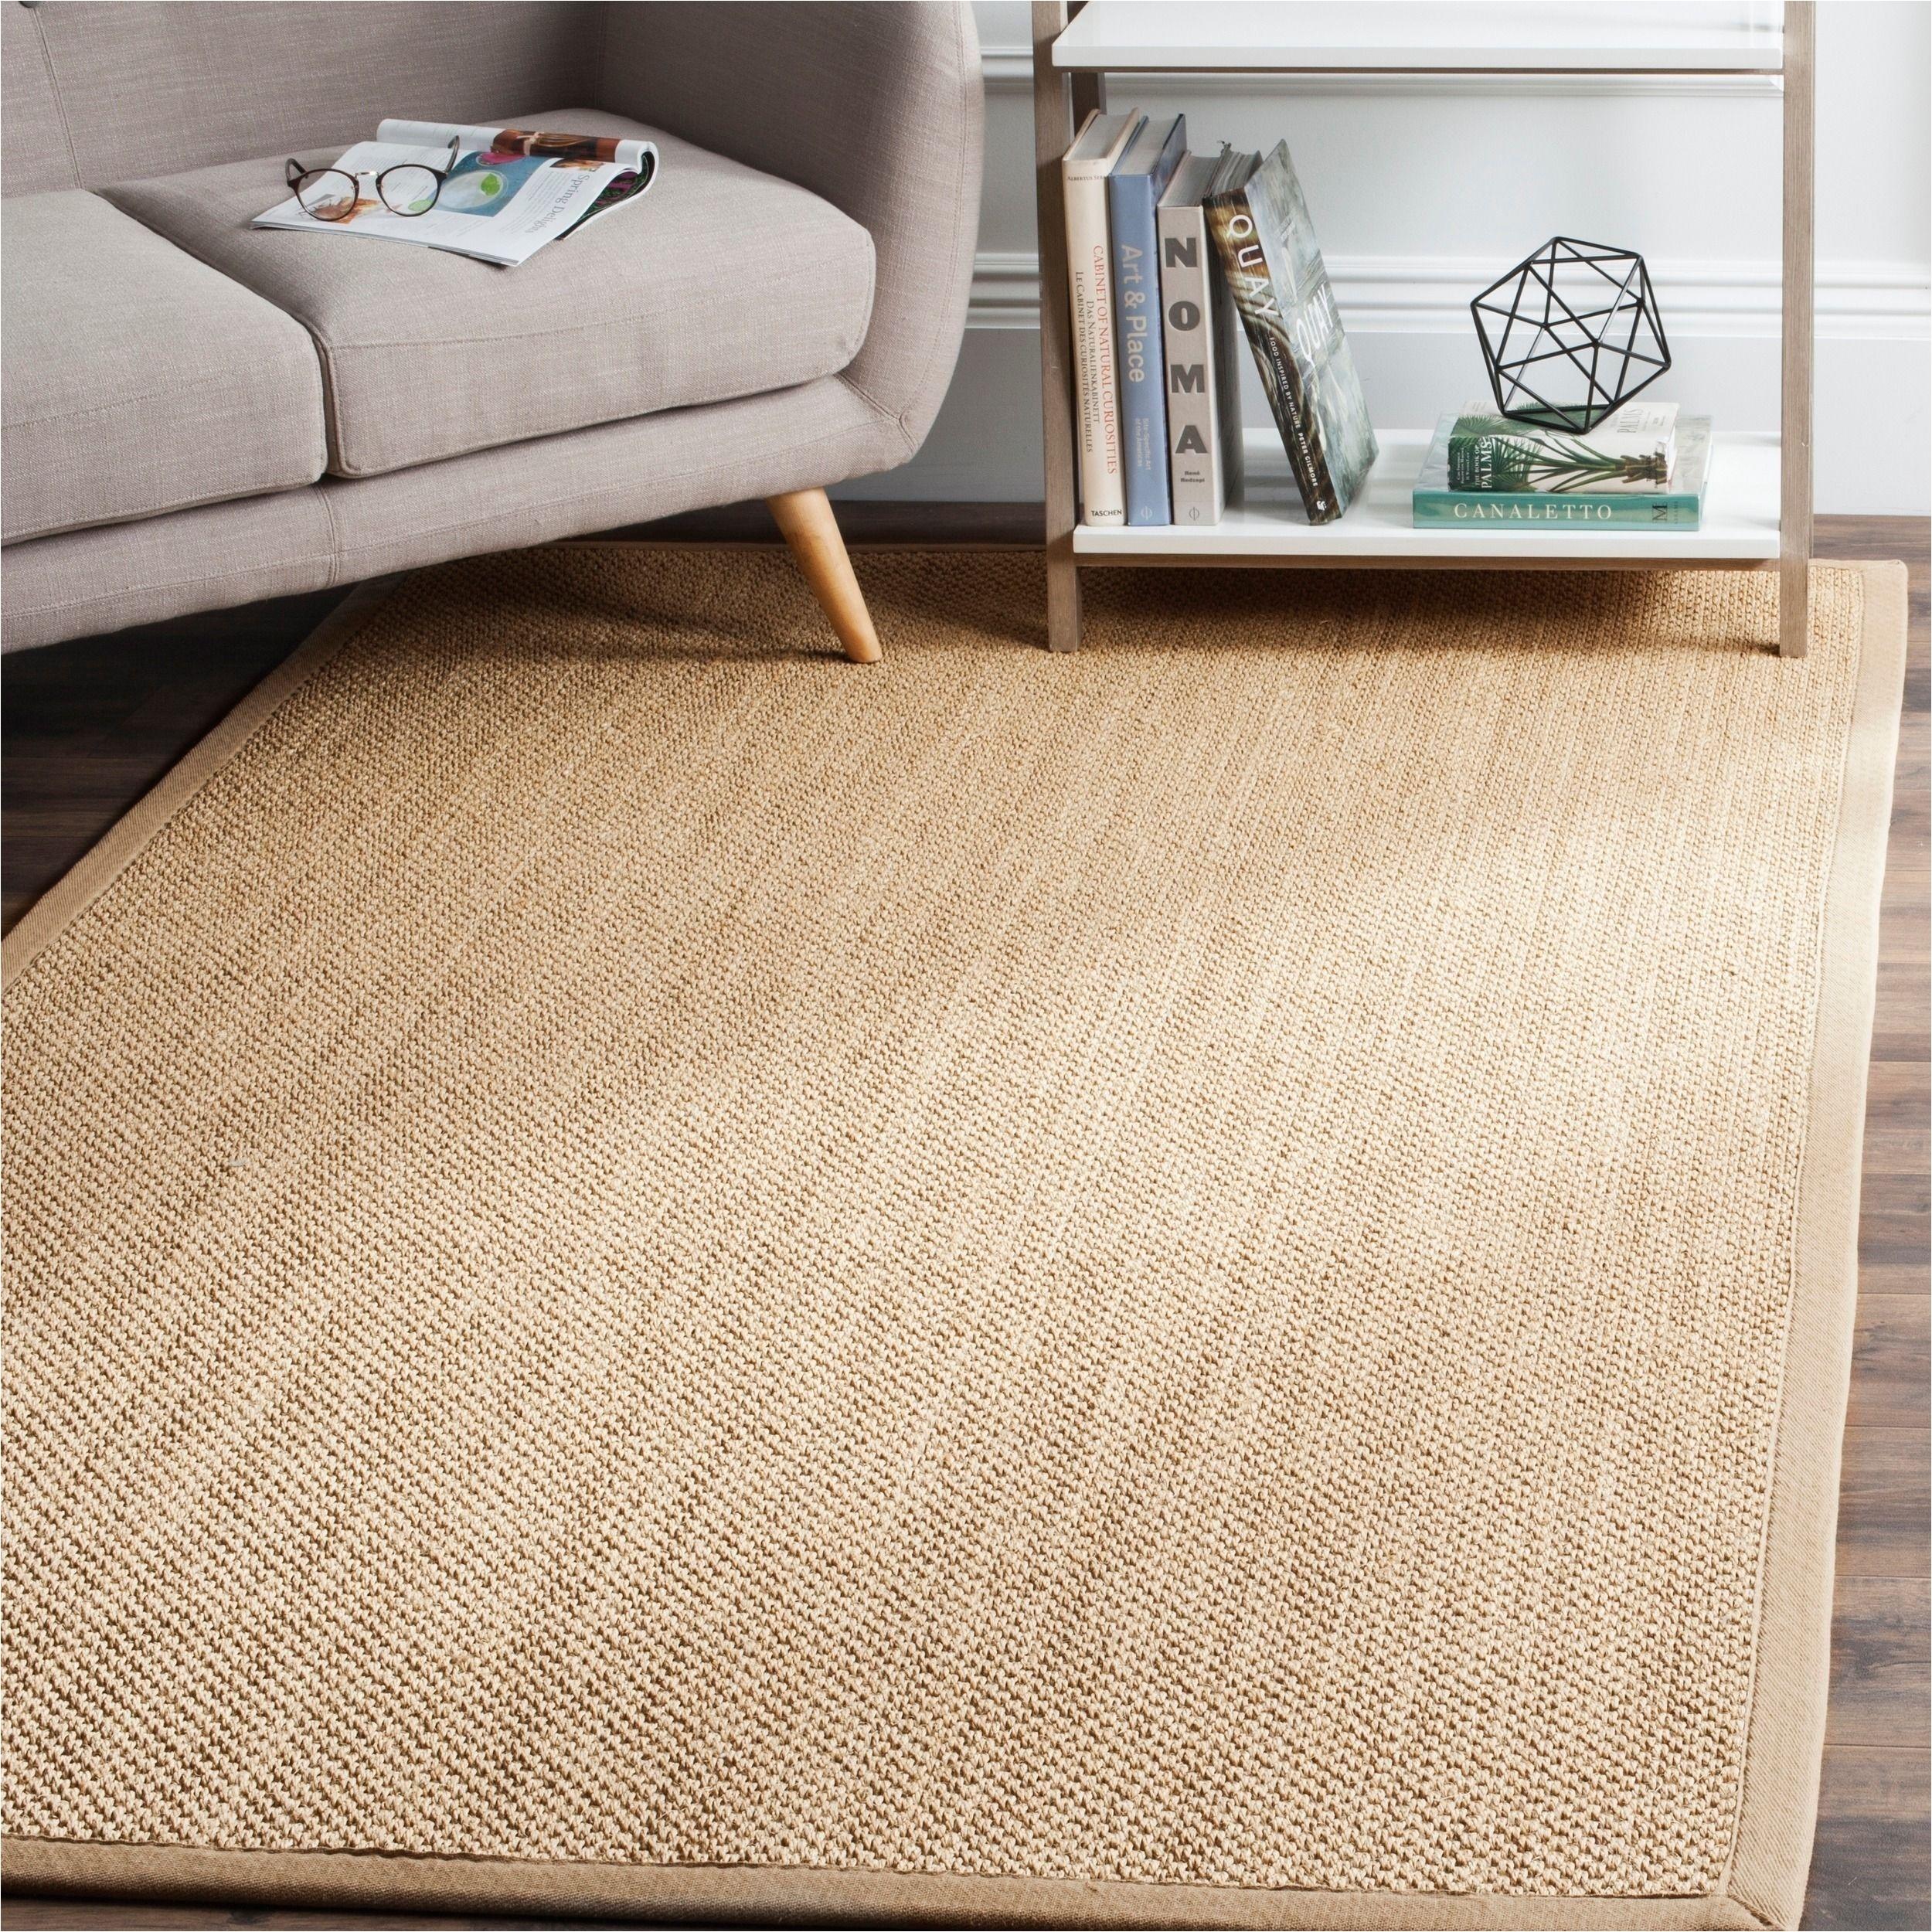 safavieh casual natural fiber handmade maize linen sisal rug 6 x 6 square nf141b 6sq beige size 6 x 6